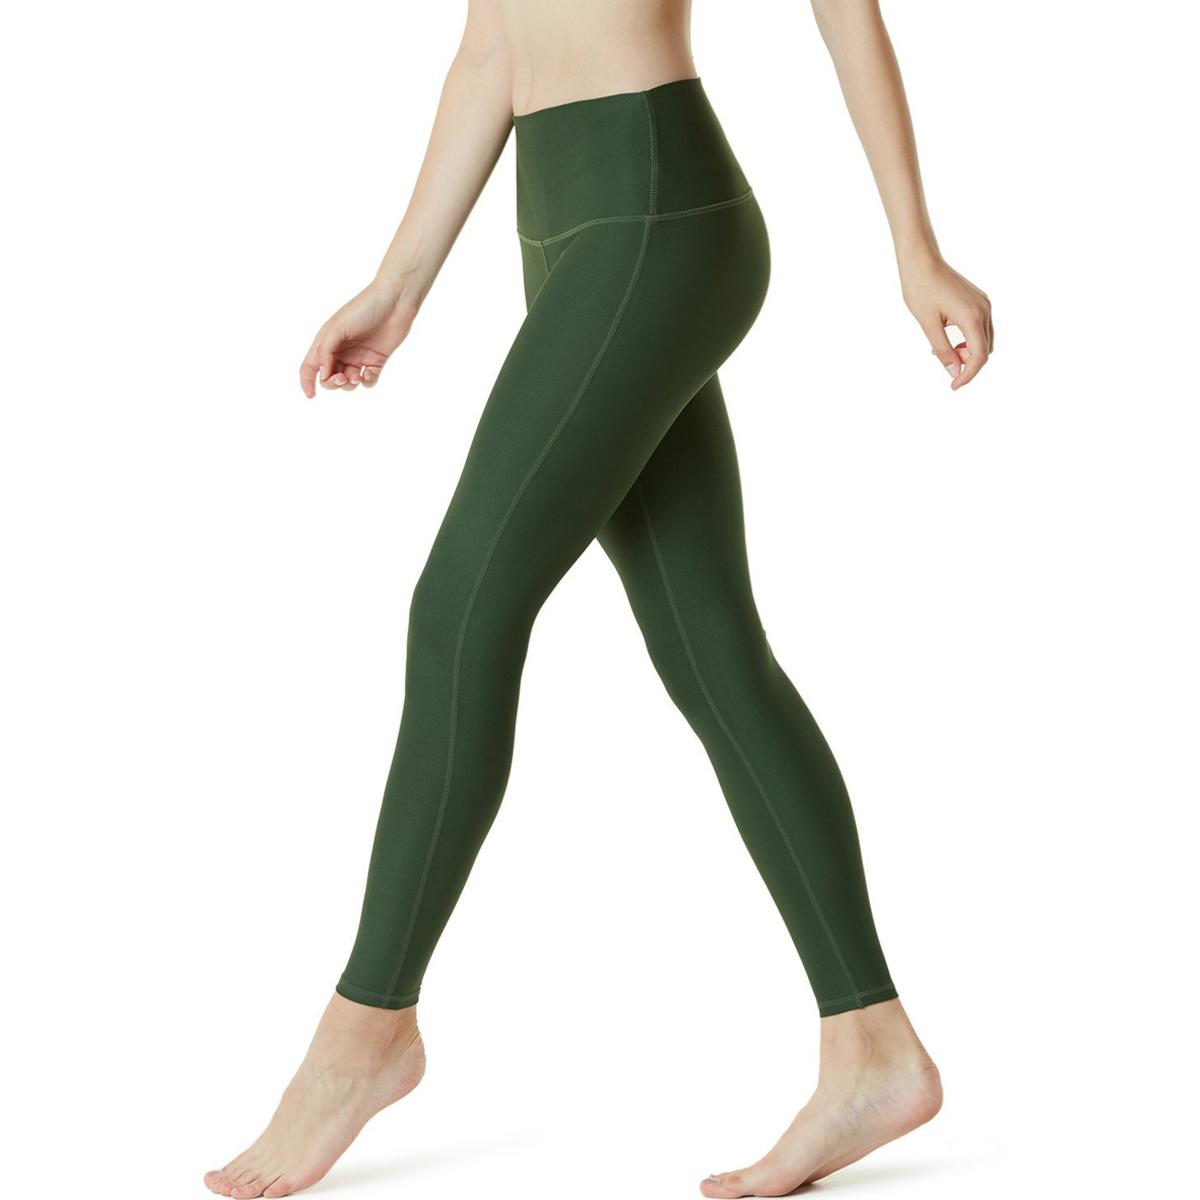 thumbnail 53 - TSLA Tesla FYP42 Women's High-Waisted Ultra-Stretch Tummy Control Yoga Pants